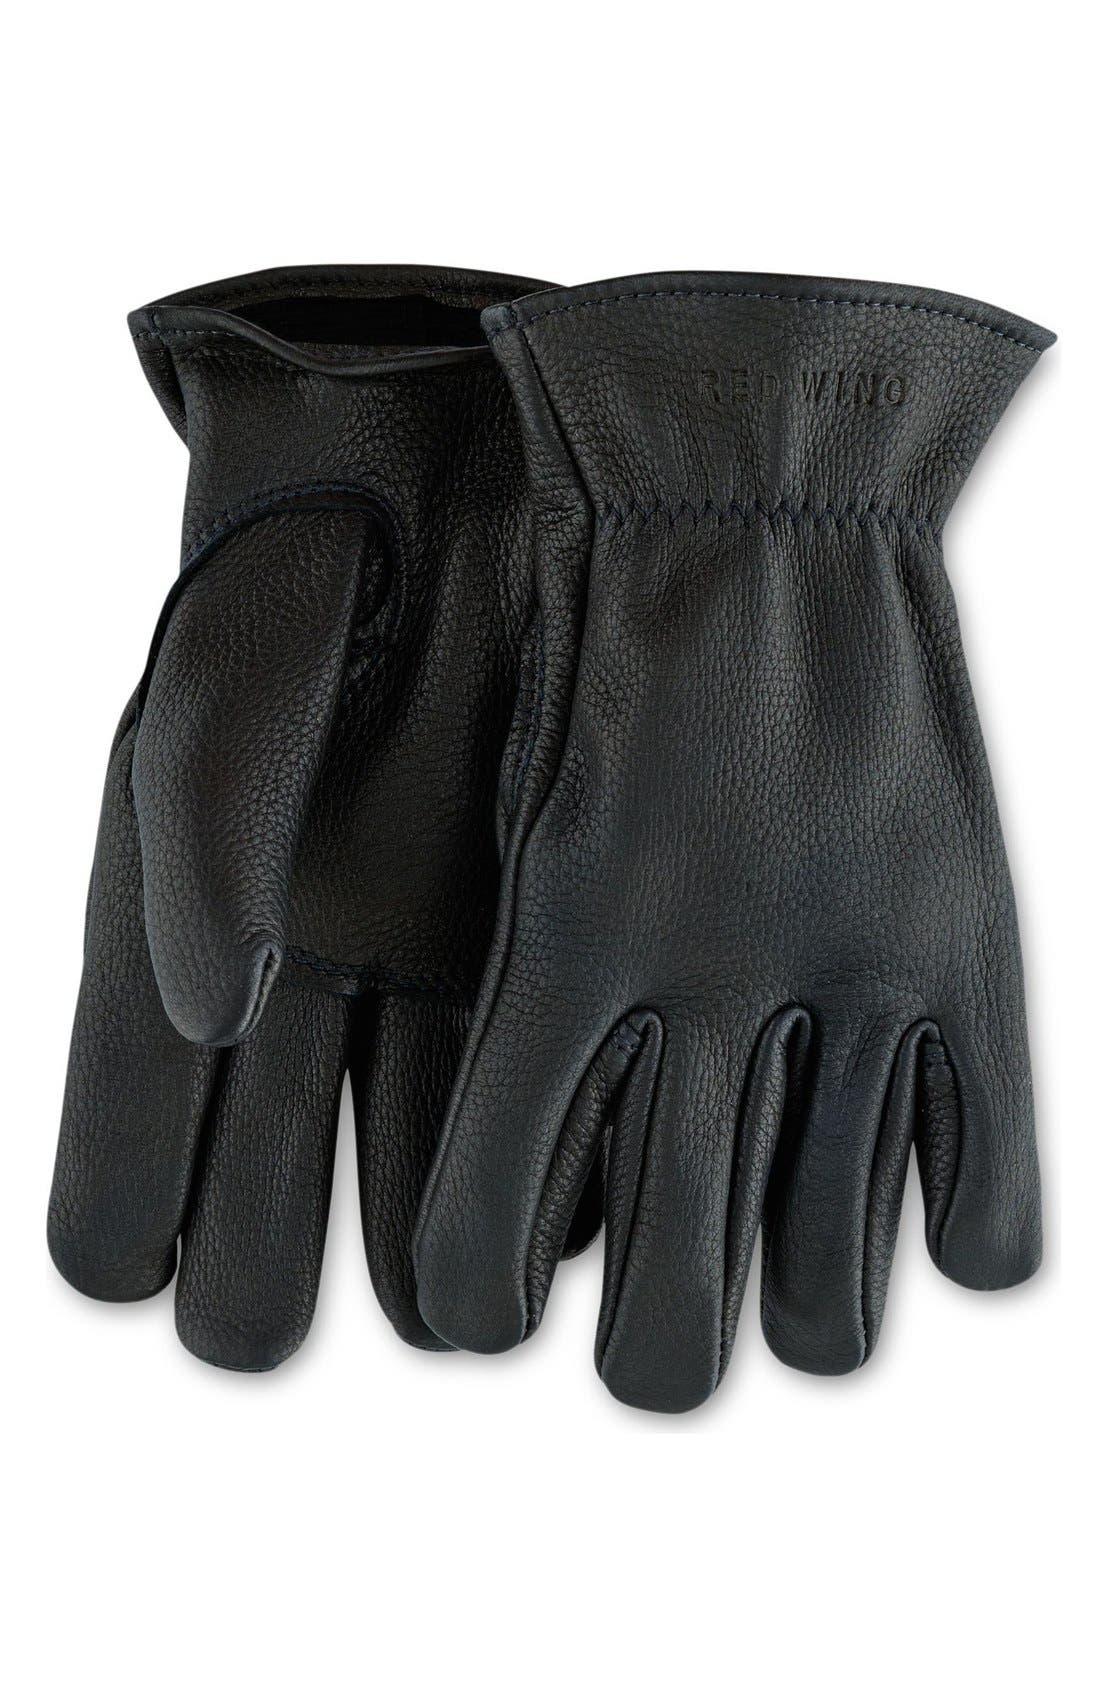 Buckskin Leather Gloves,                         Main,                         color,